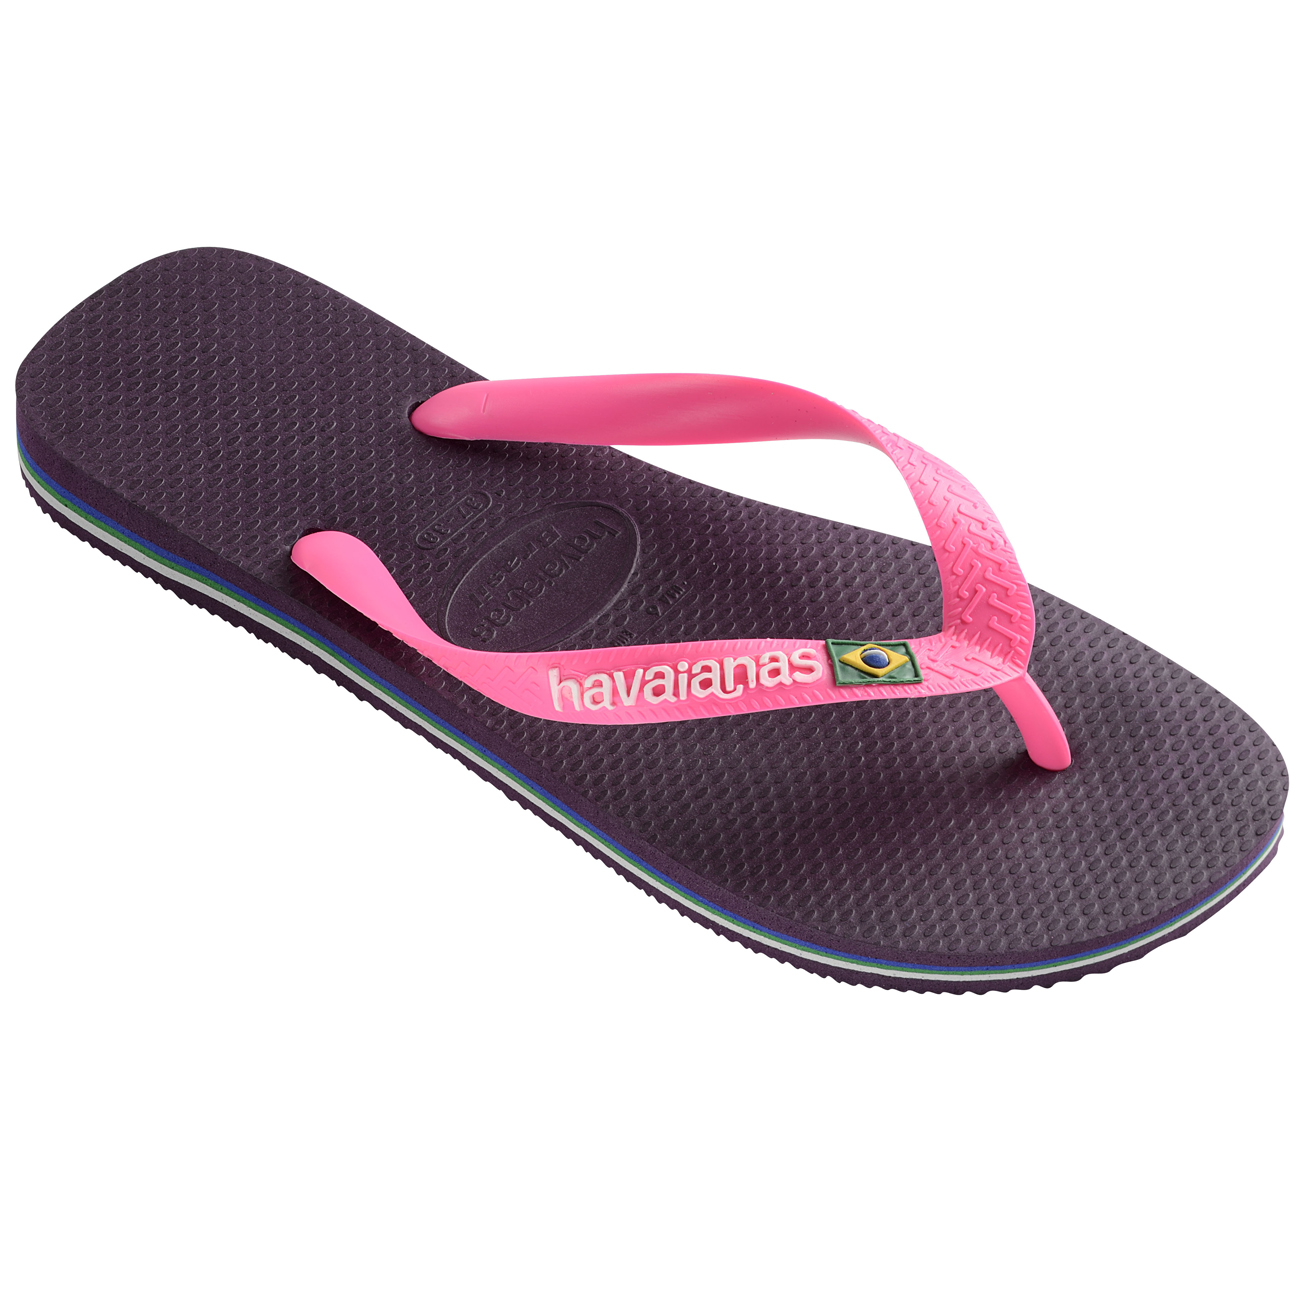 womens havaianas brasil logo rubber thongs sandals slip on